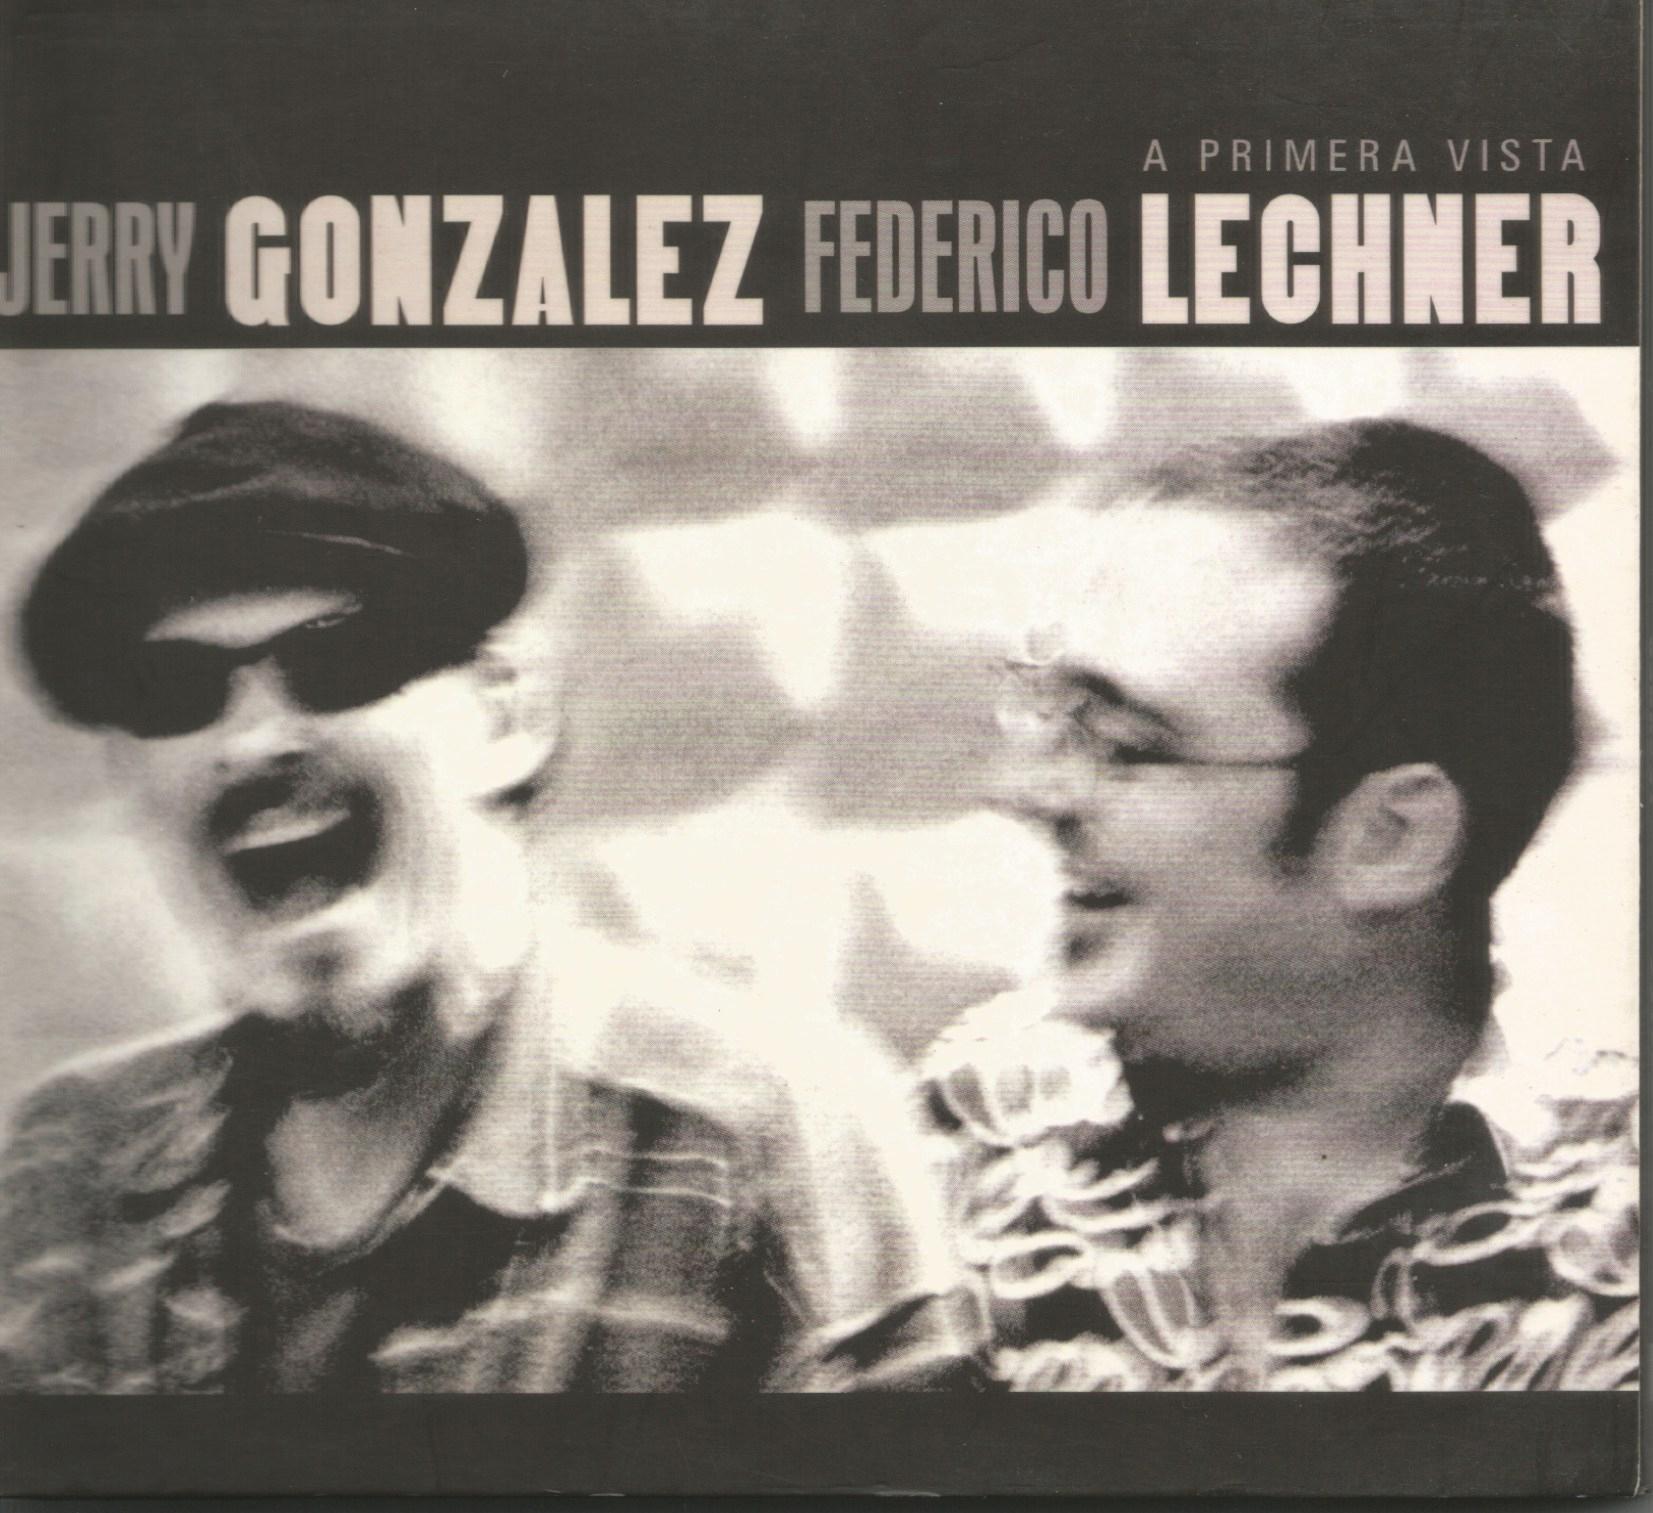 "CD ""A PRIMERA VISTA"". FEDERICO LECHNER Y JERRY GONZÁLEZ"